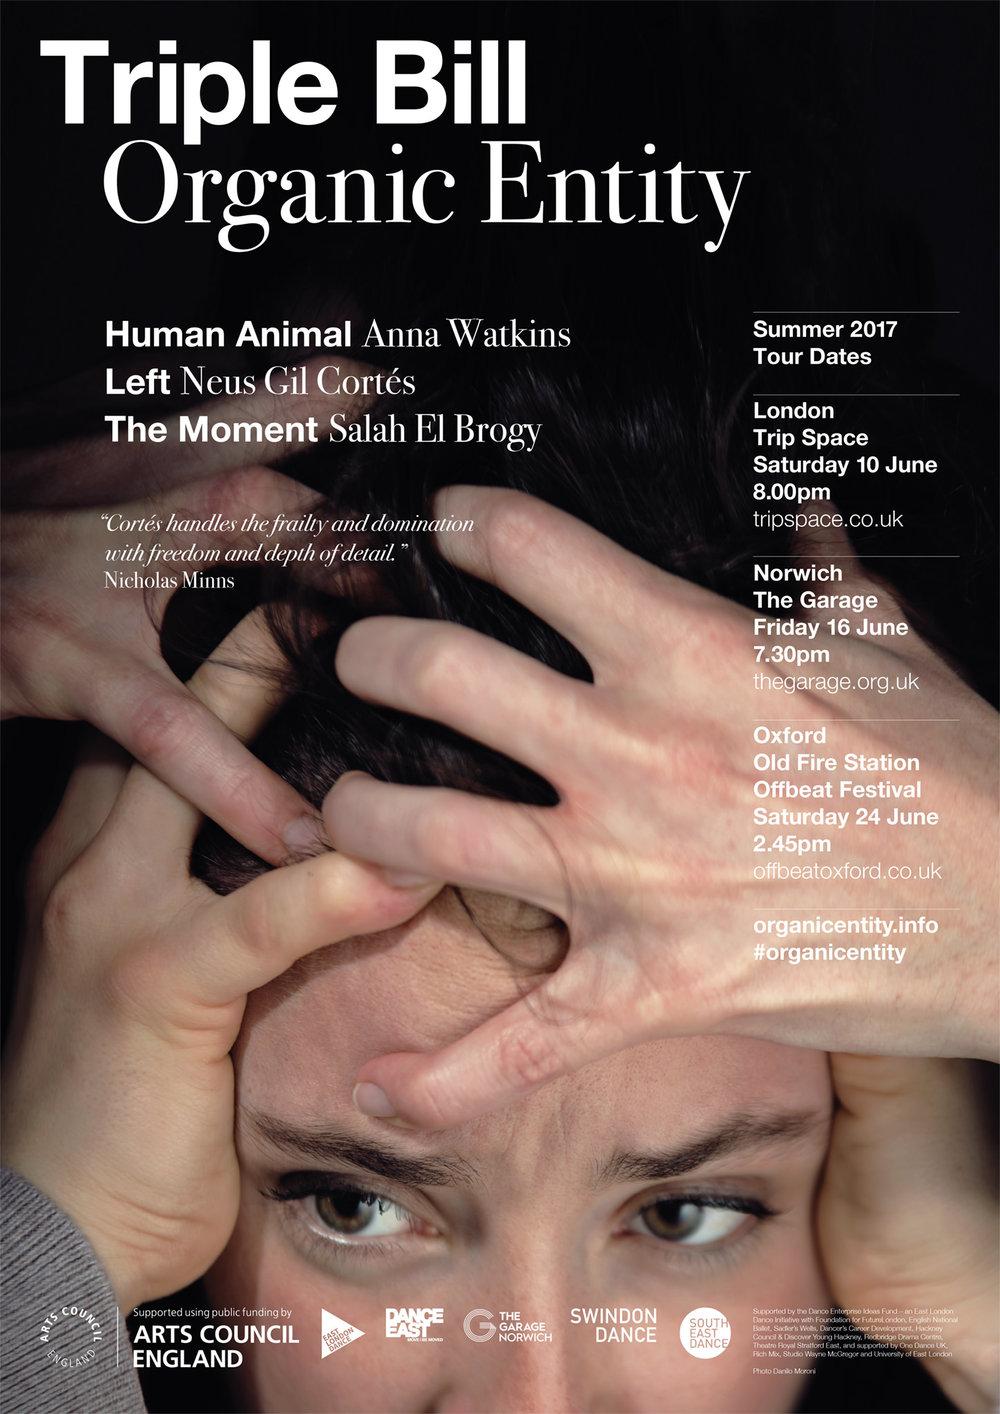 Triple_Bill_Poster2_Organic_Entity_photo_Danilo_Moroni.jpg.jpg